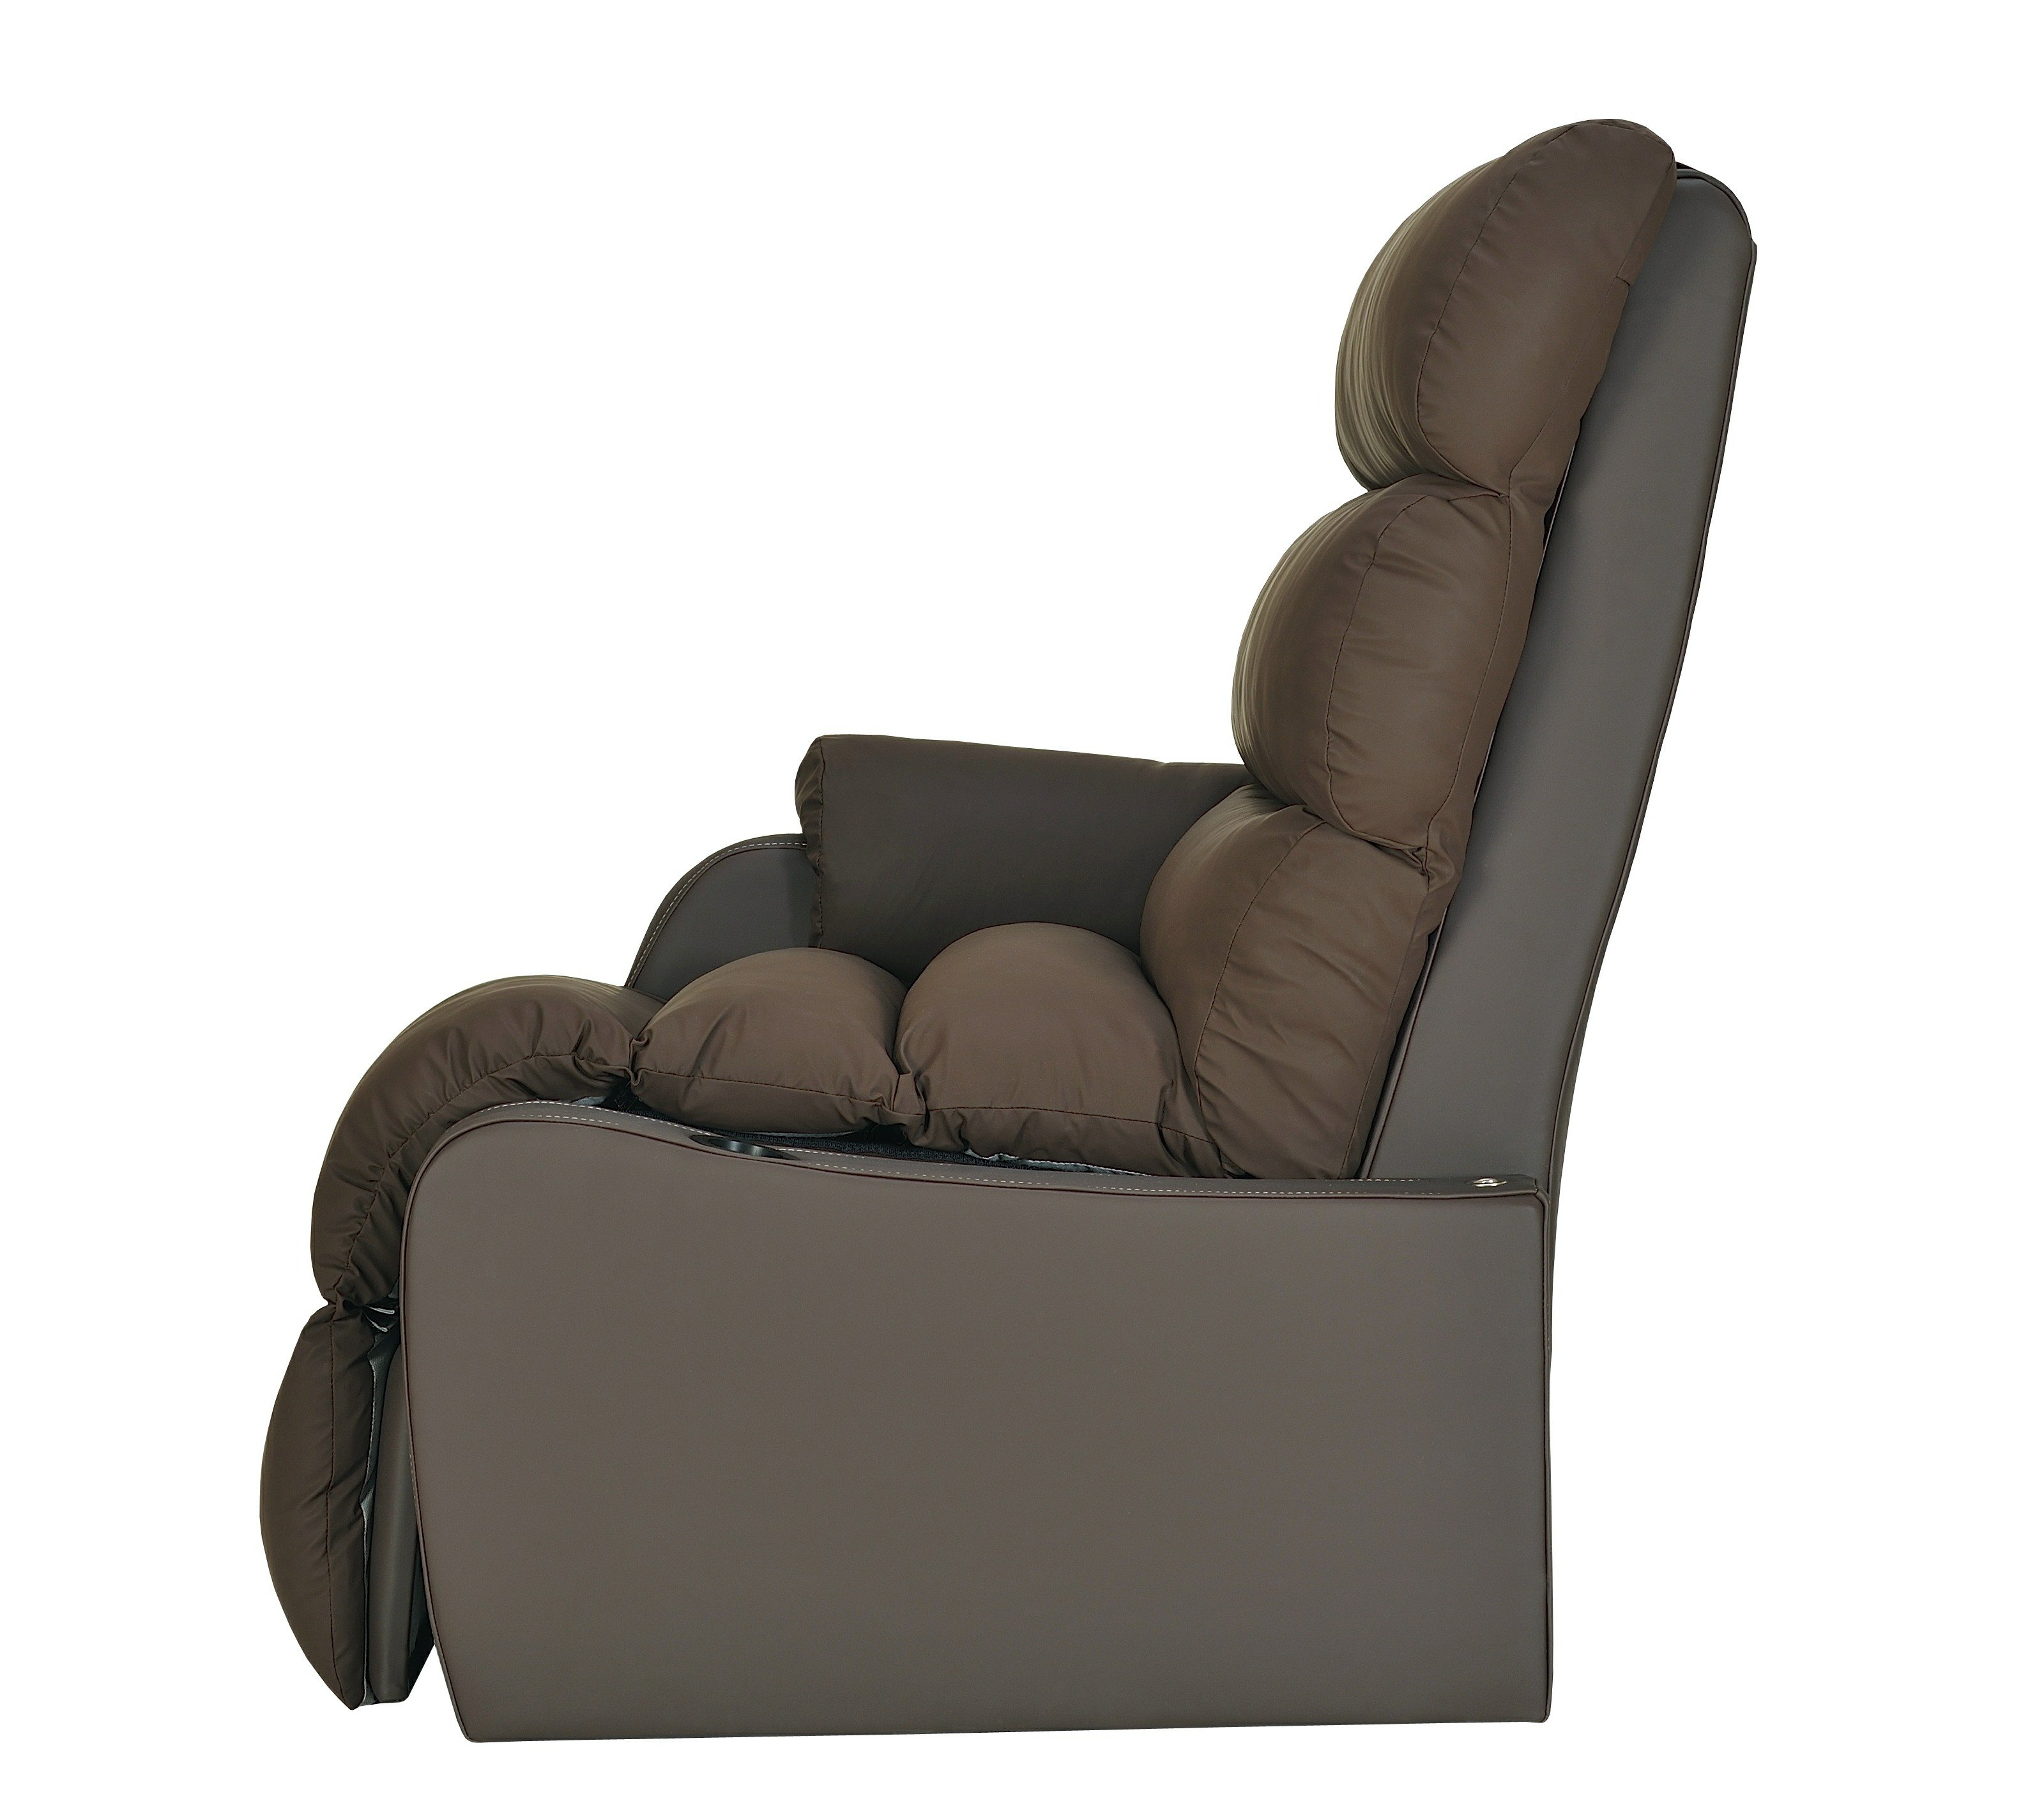 Gemini rise and recline chair.